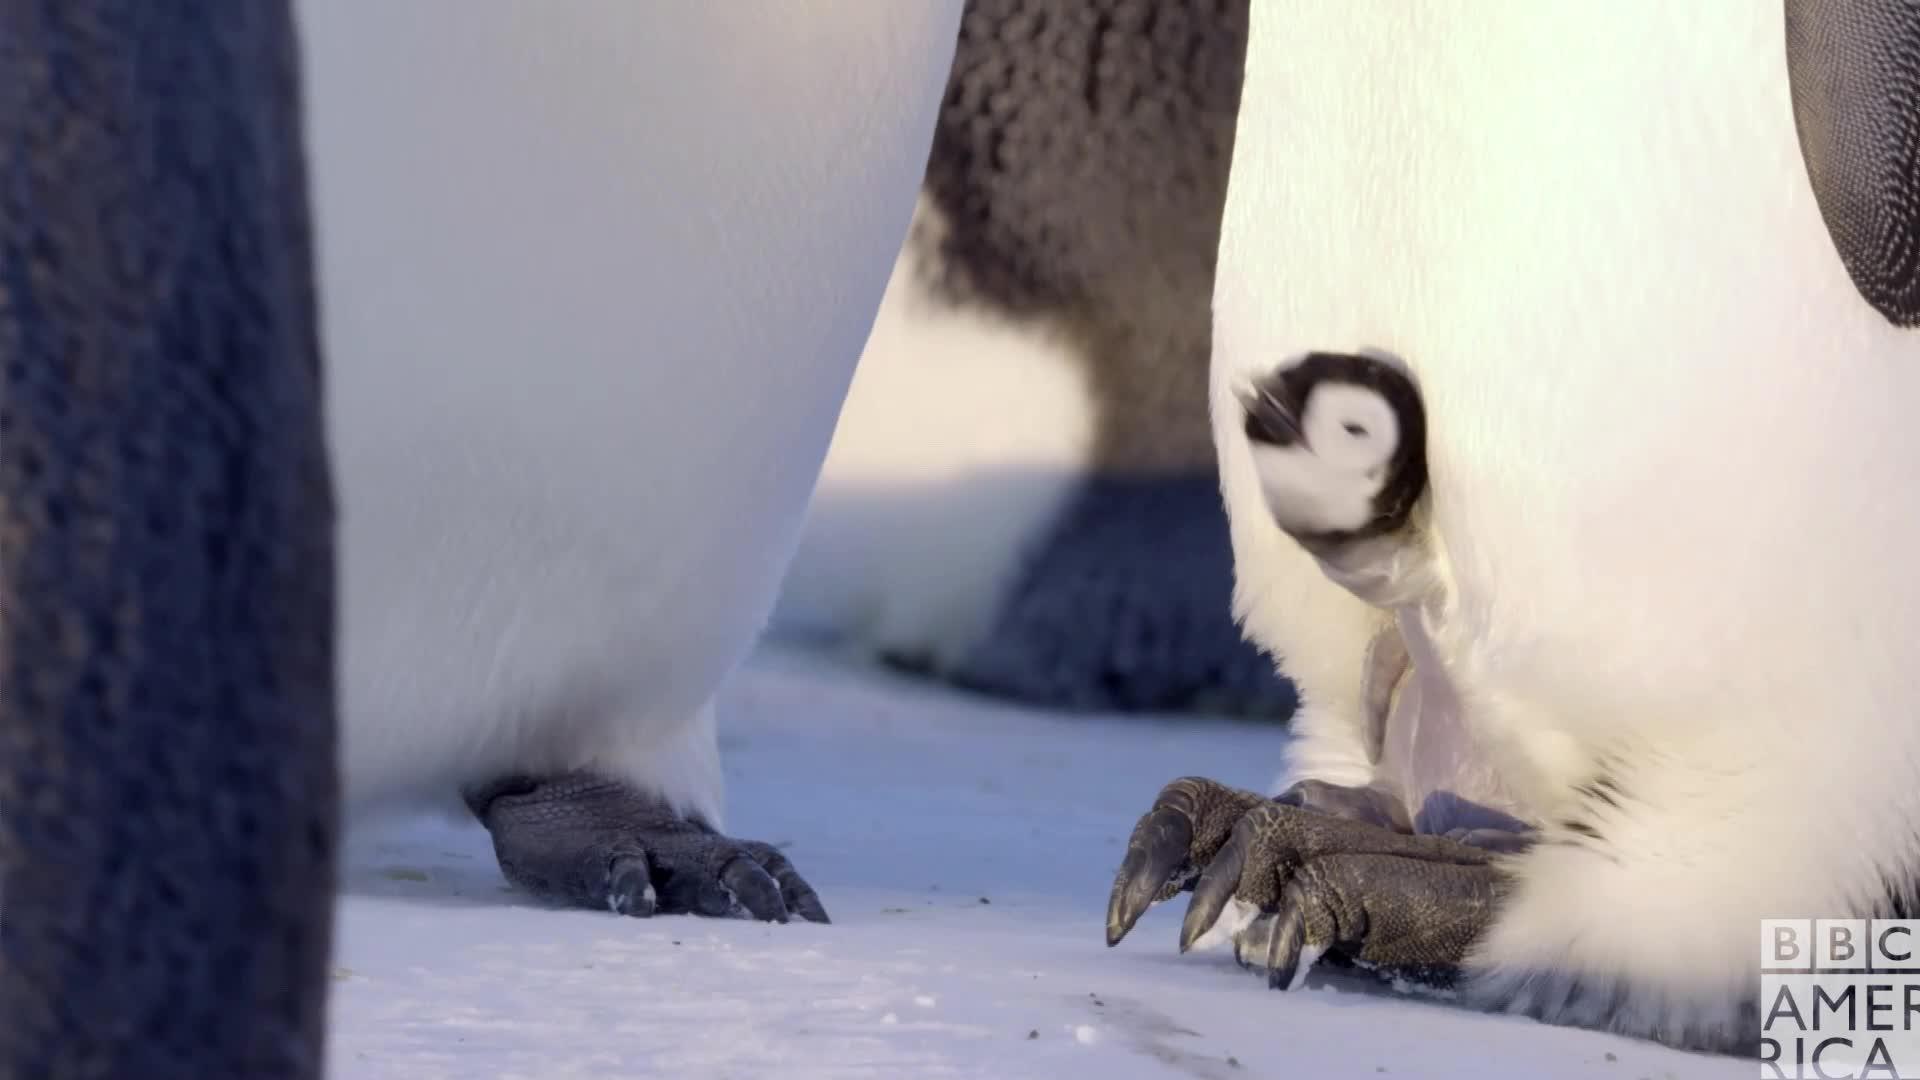 animal, animals, awww, bbc america, bbc america dynasties, bbc america: dynasties, cute, dynasties, emperor penguin, emperor penguins, penguin, penguins, Dynasties Baby Penguin GIFs